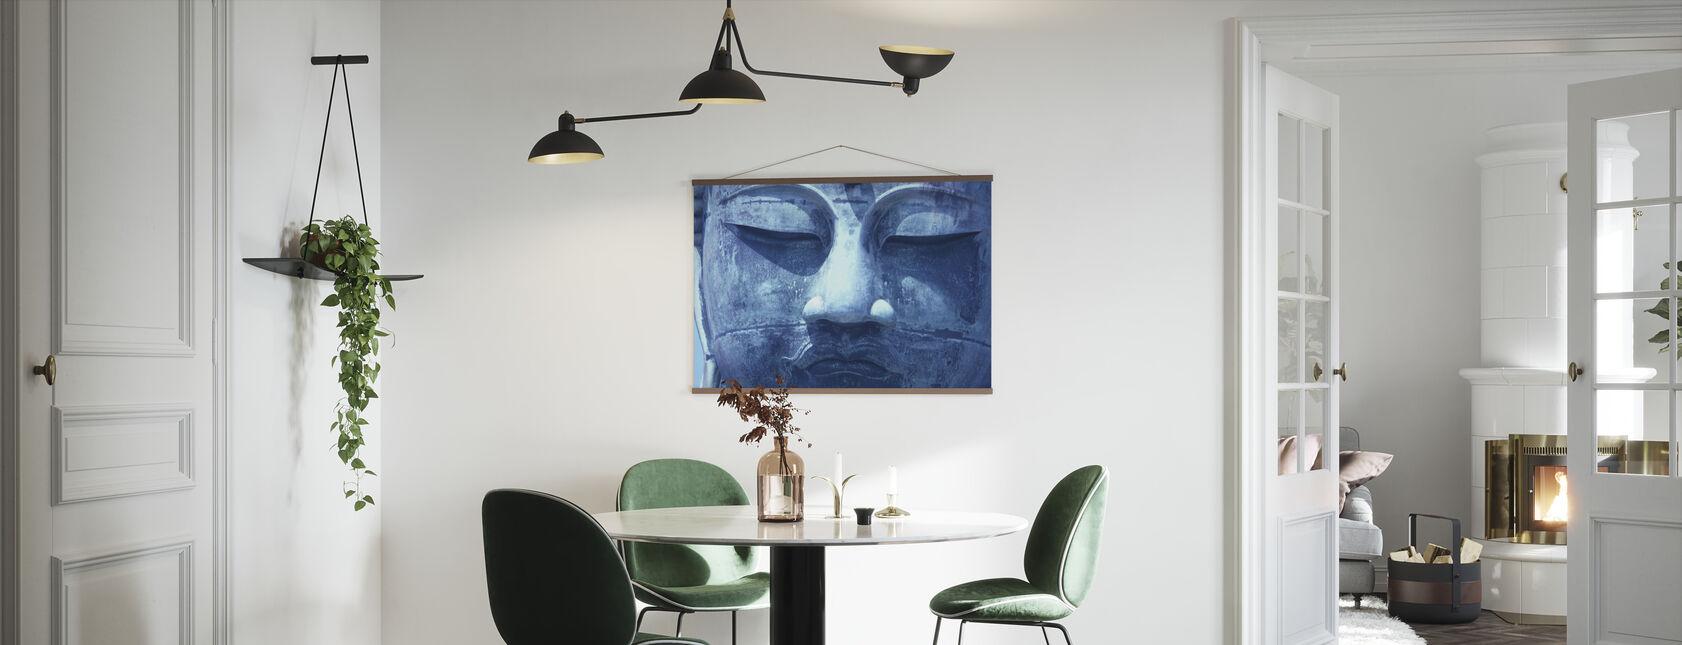 Blå Buddha - Poster - Kök